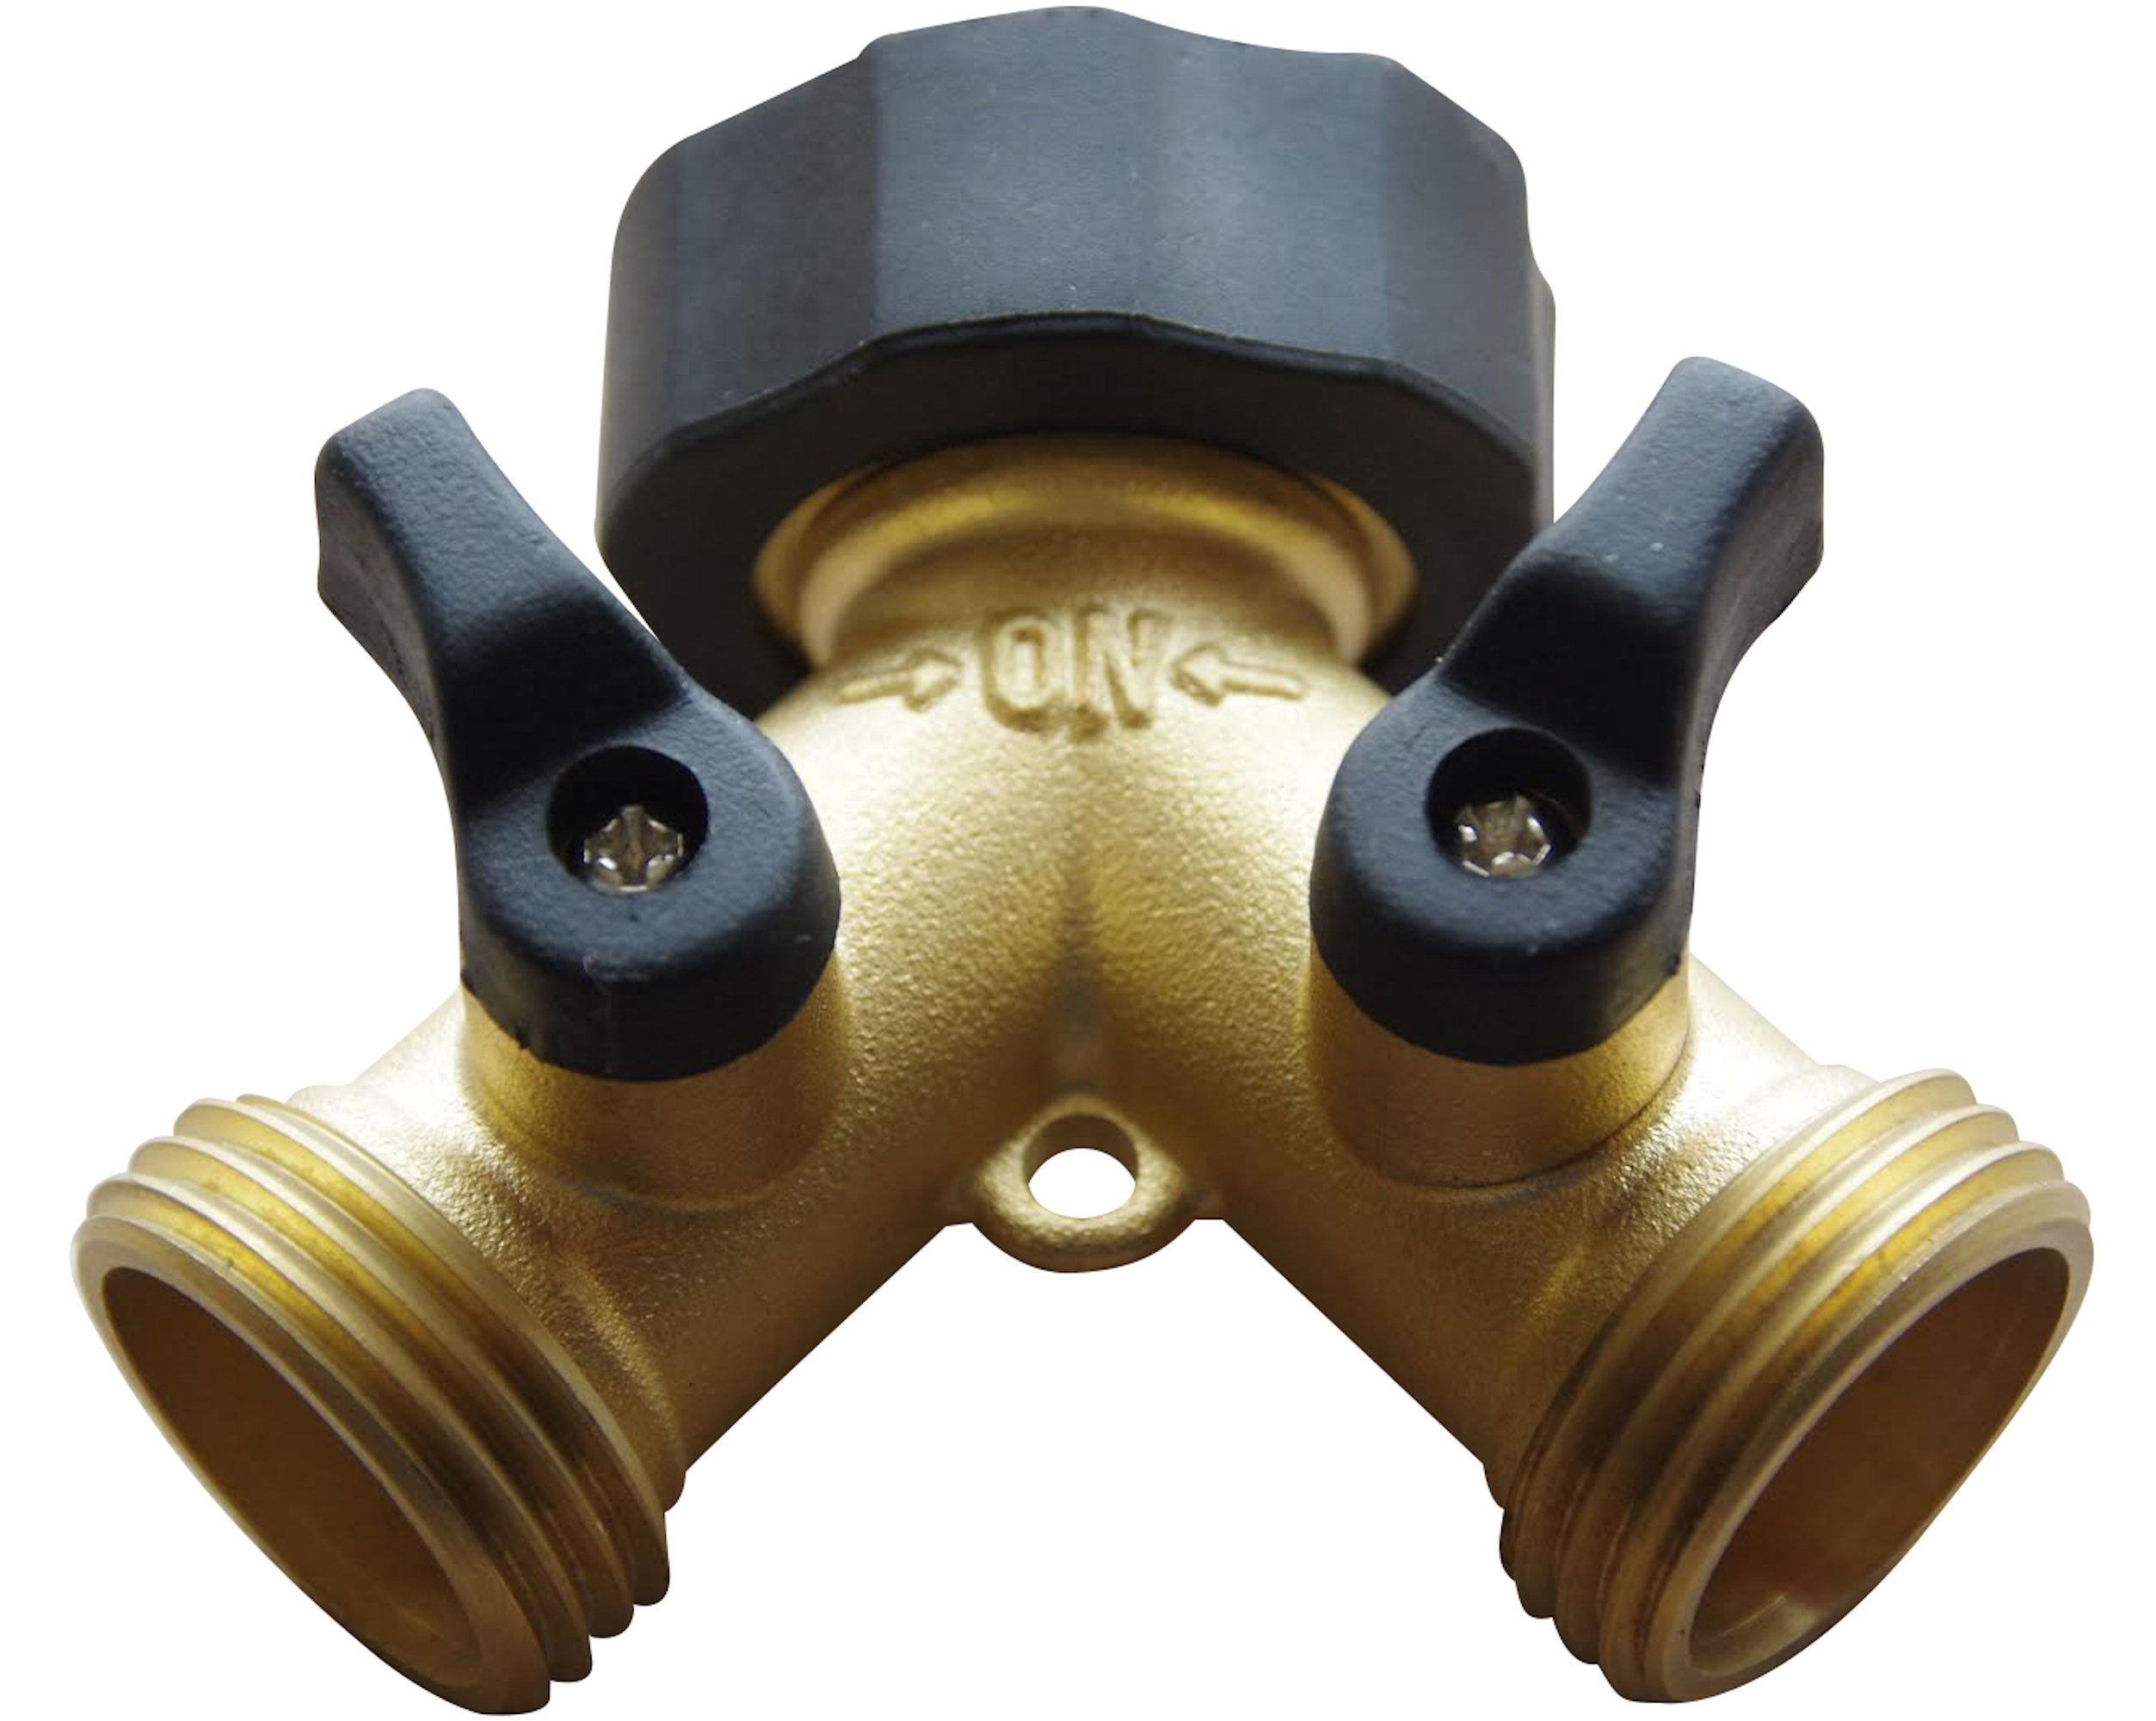 BRASS 2 WAY VALVE - Easy Turn Brass Hose Splitter Made from Durable Brass for Smart Homeowners - 2 Way Hose Splitter Full Flow for Dual Hose Garden